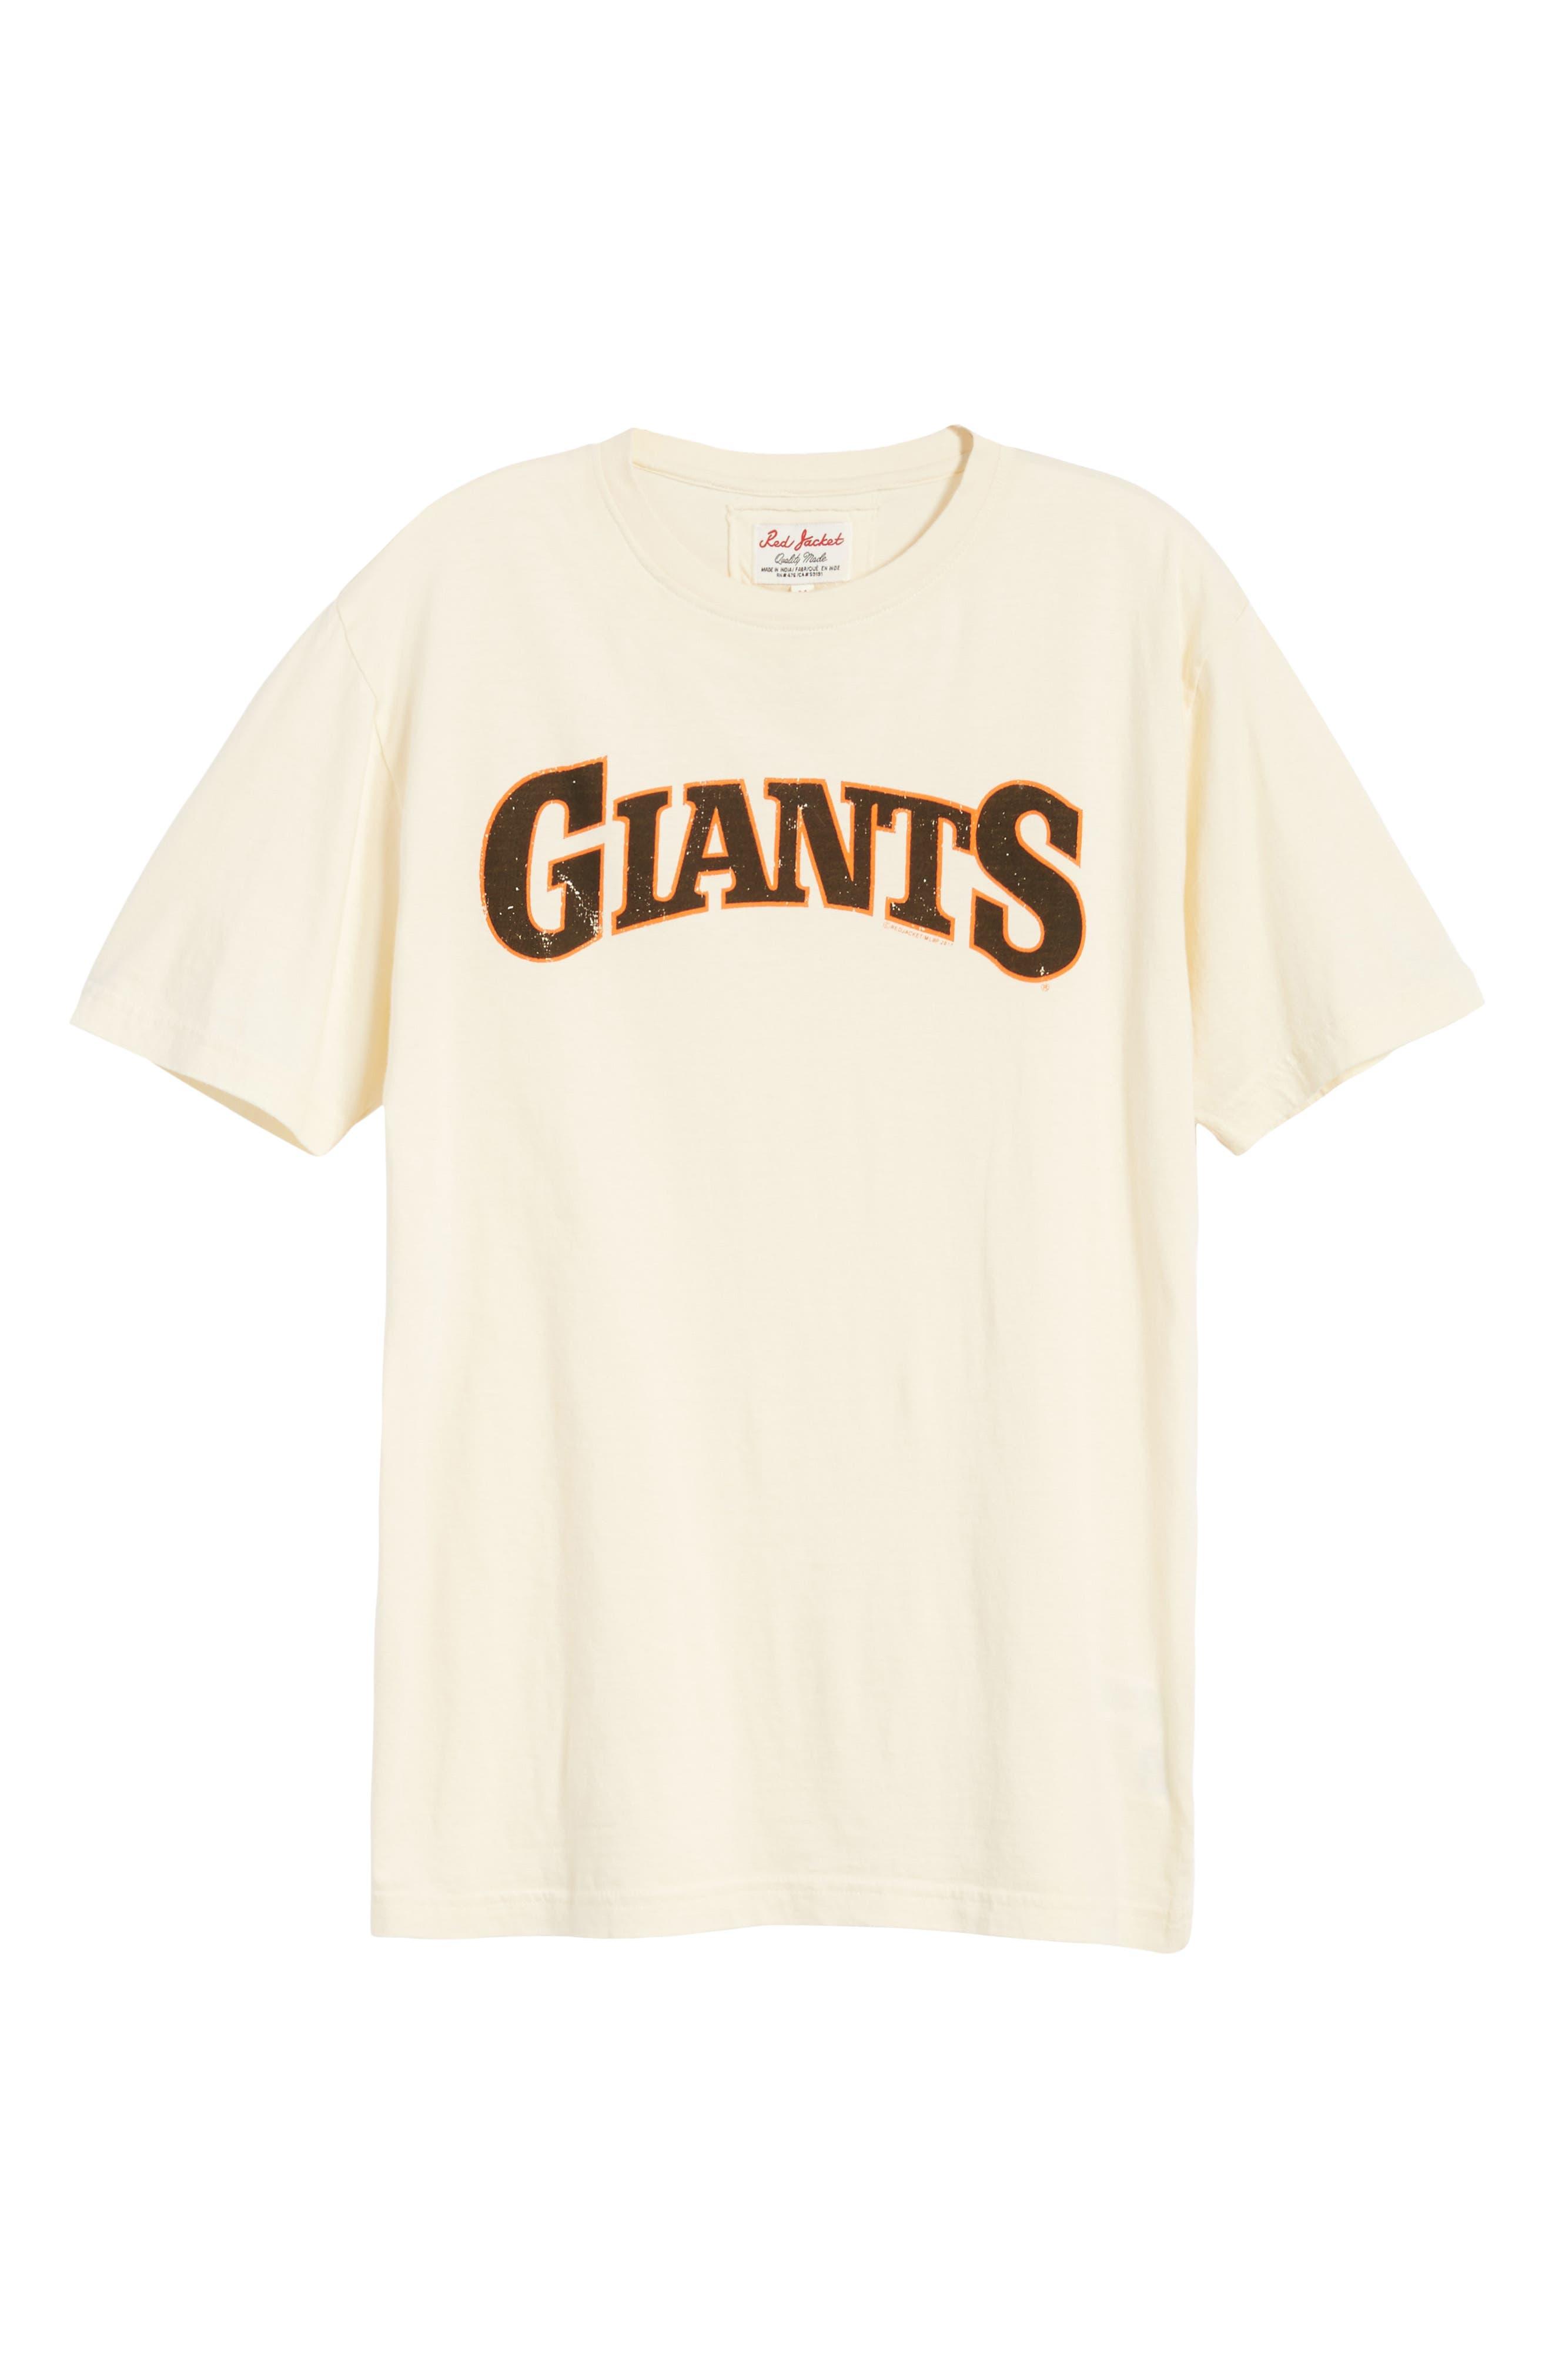 Brass Tack San Francisco Giants T-Shirt,                             Alternate thumbnail 6, color,                             124